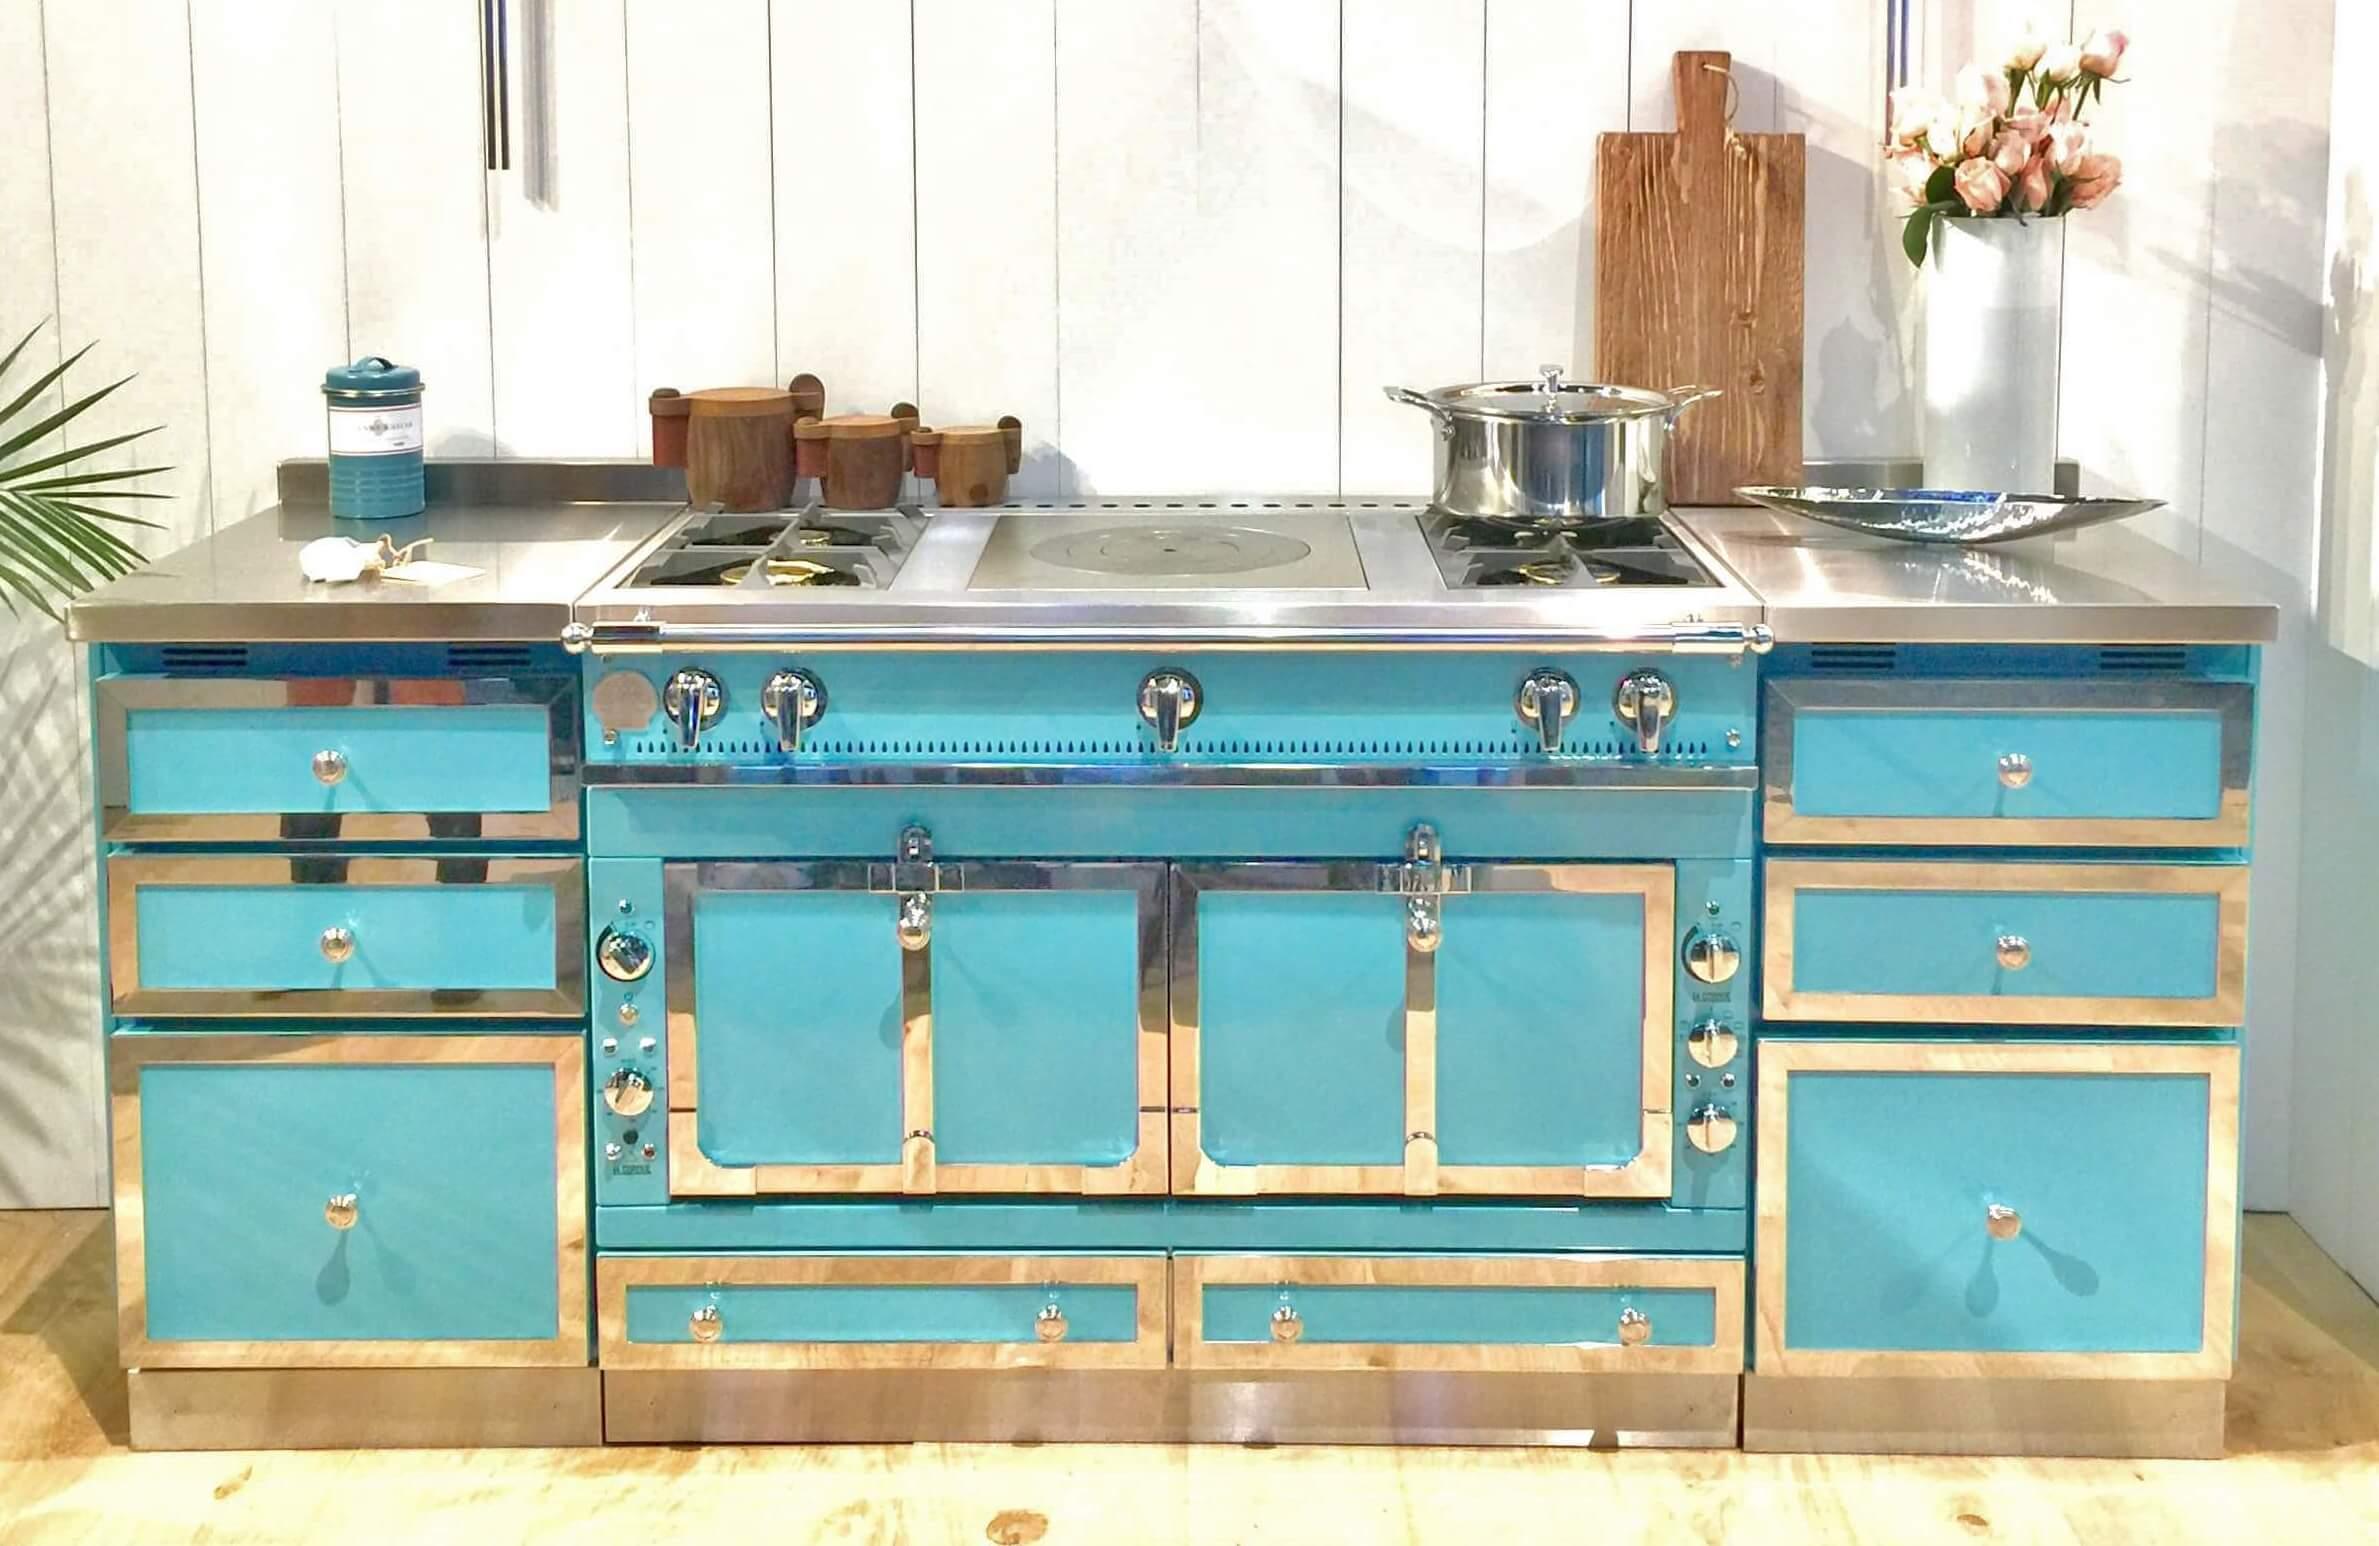 La Cornue range - KBIS Kitchen and Bath Industry Show